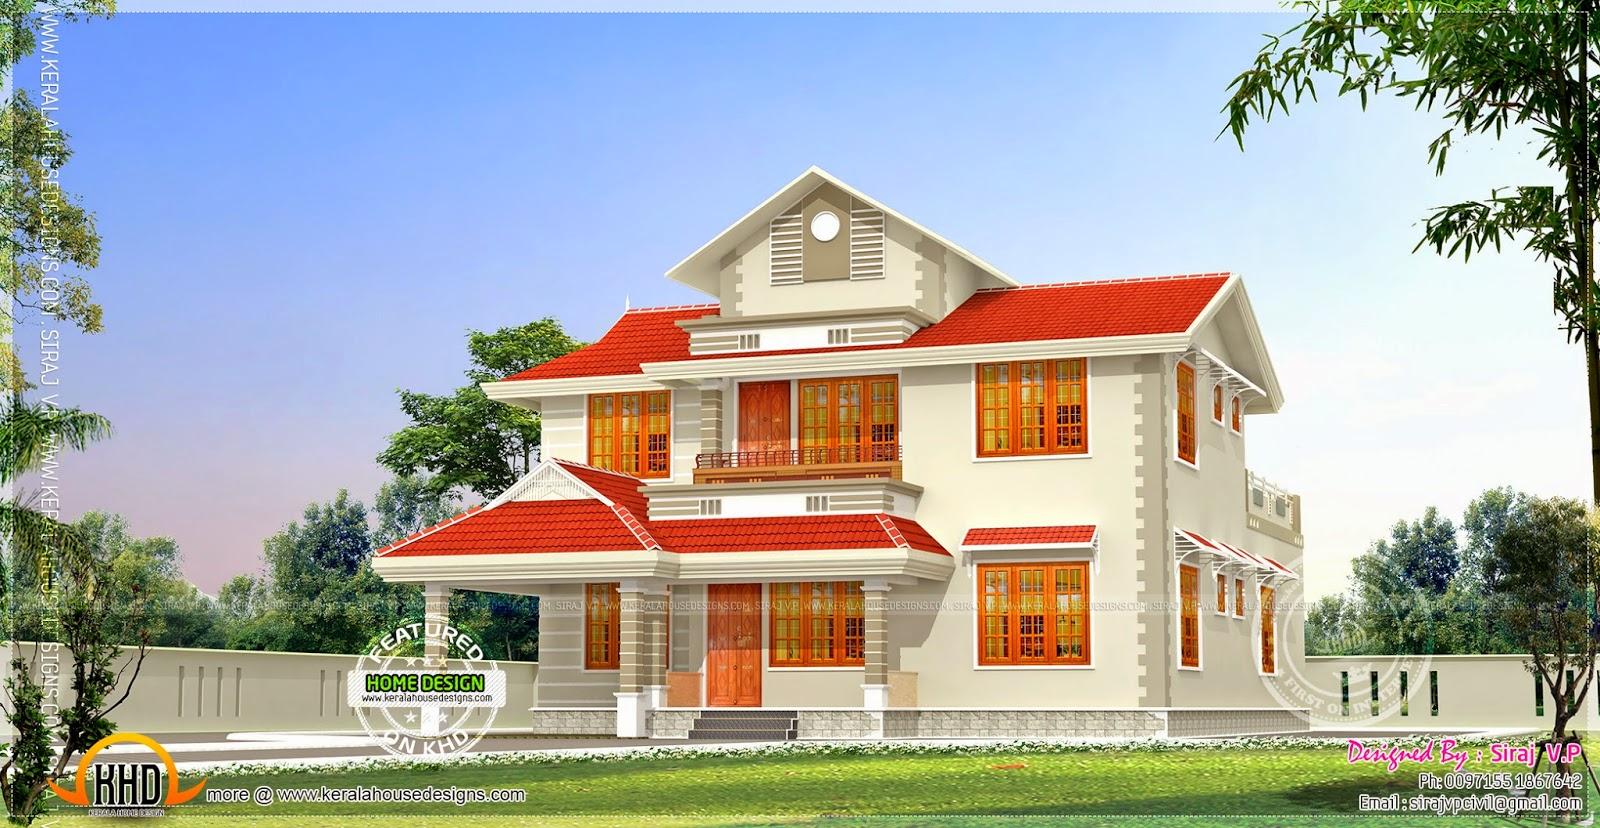 2020 square feet Kerala model residence exterior - Kerala home design and floor plans